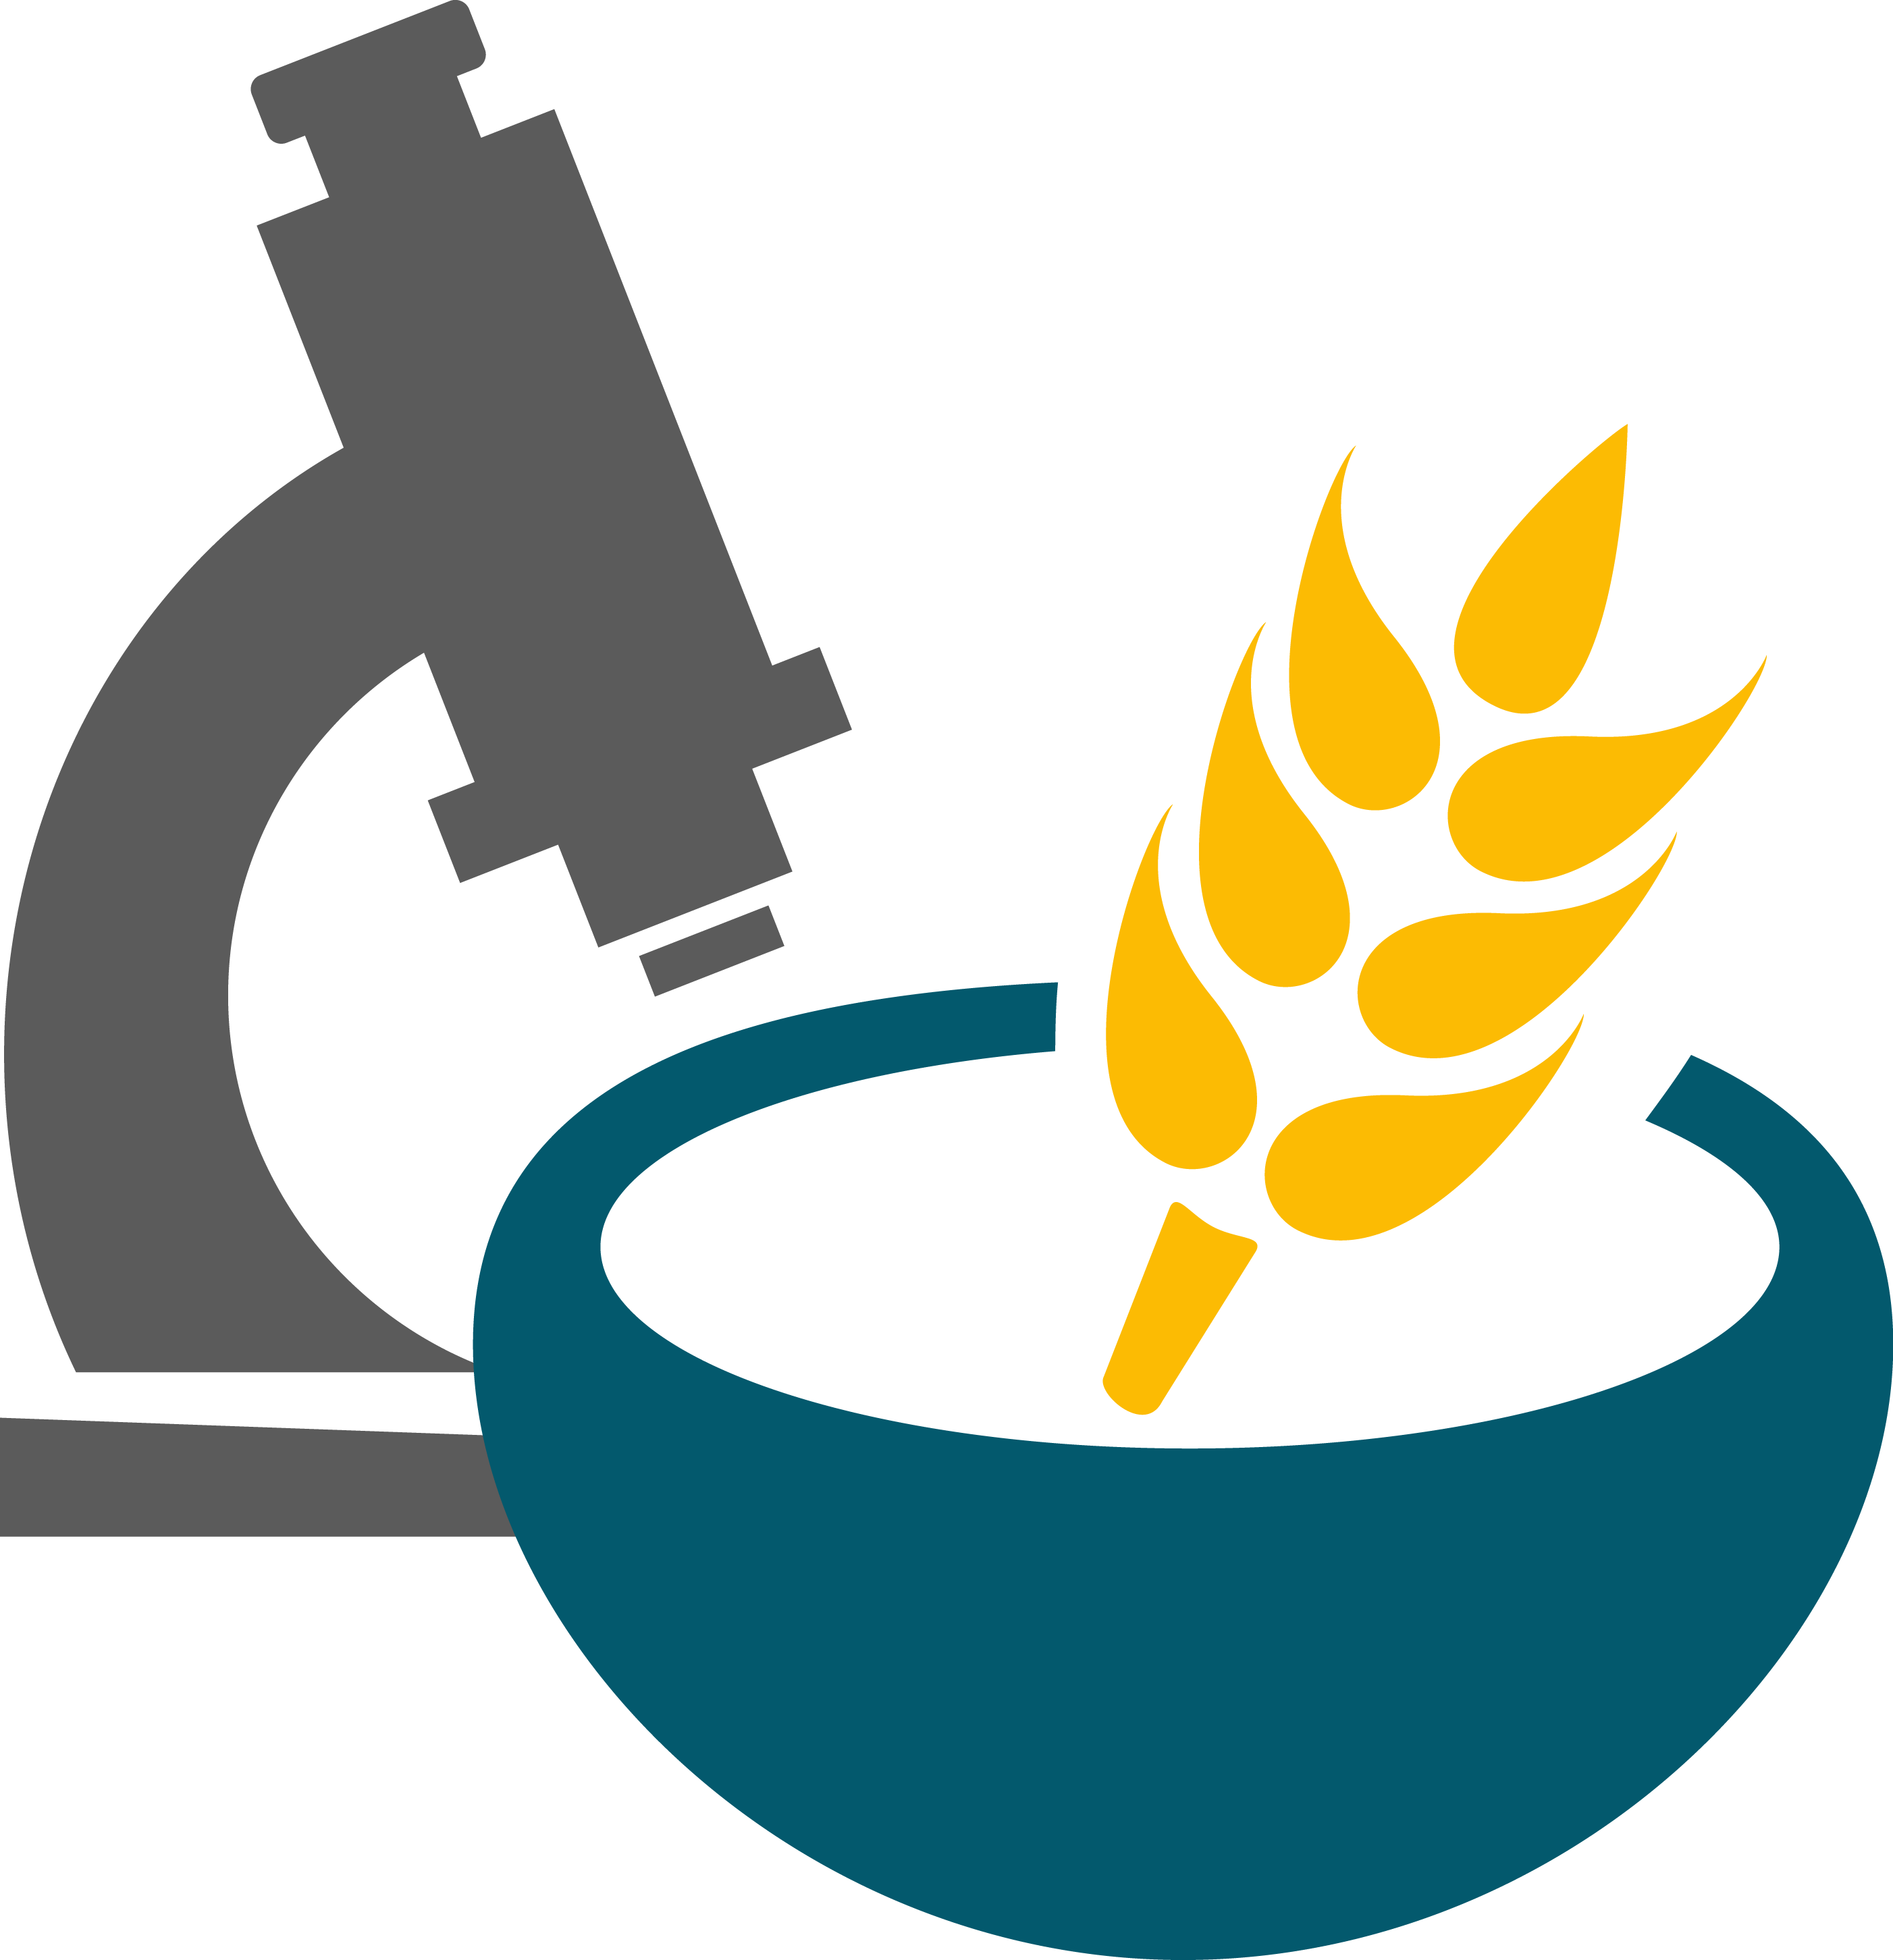 picto secteur securite alimentaire